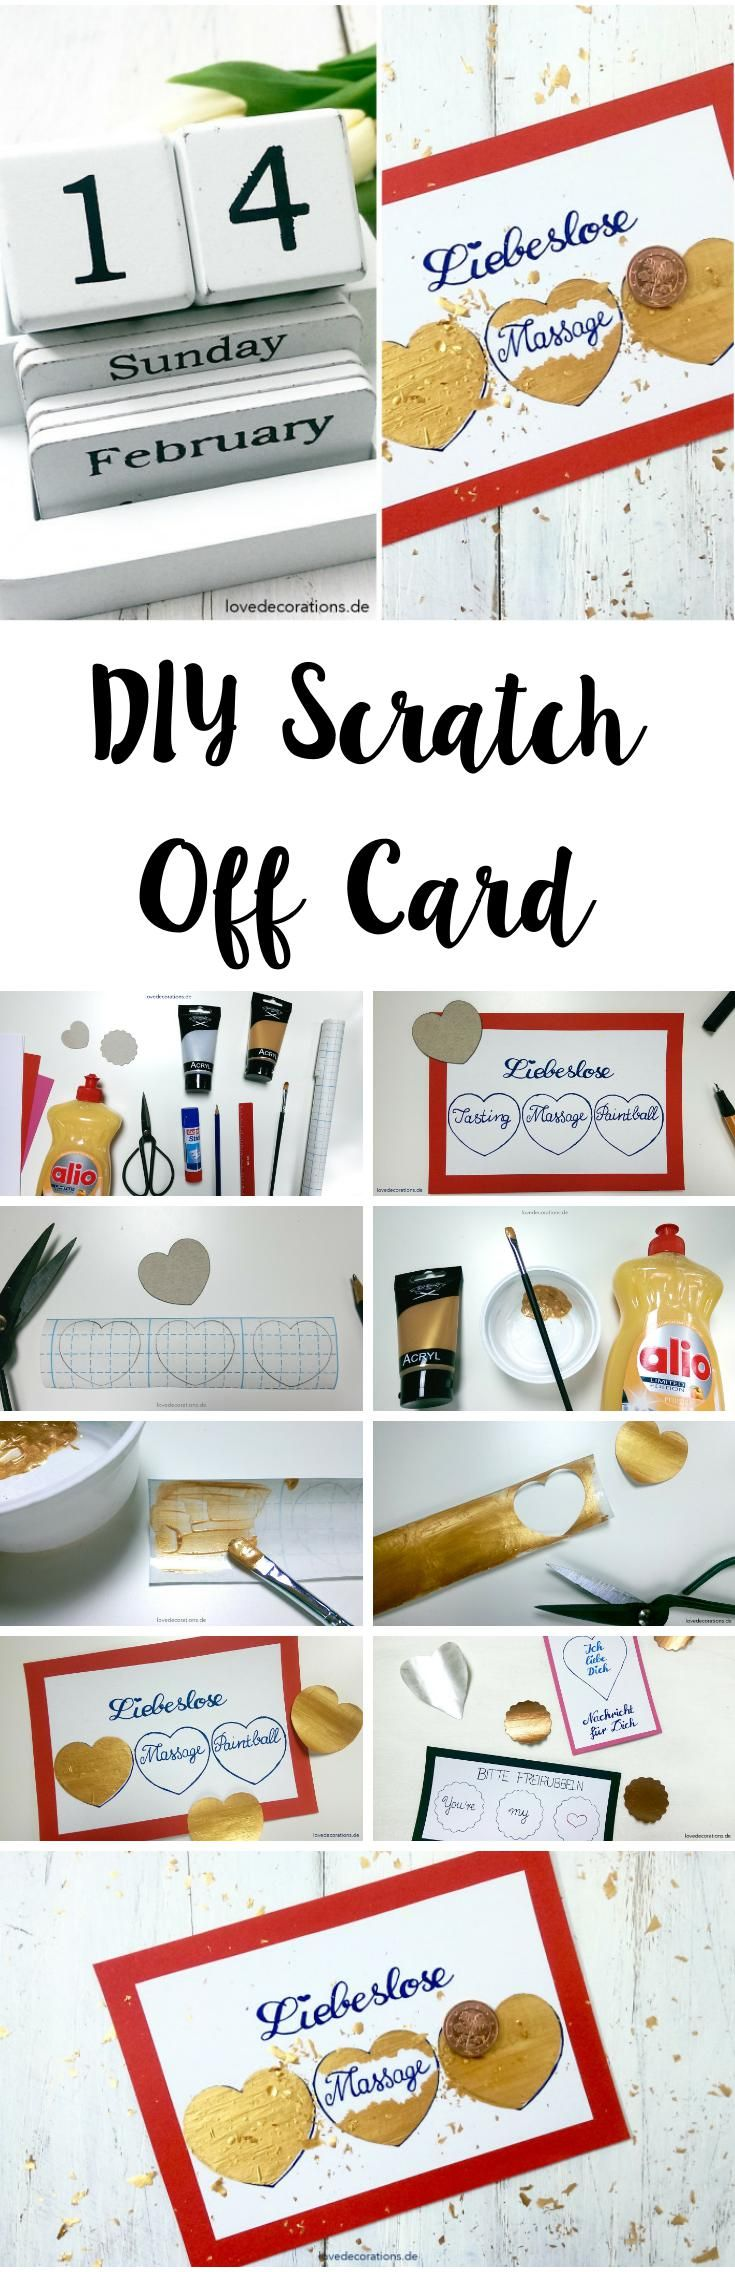 DIY Rubbelkarte | DIY Scratch Off Card